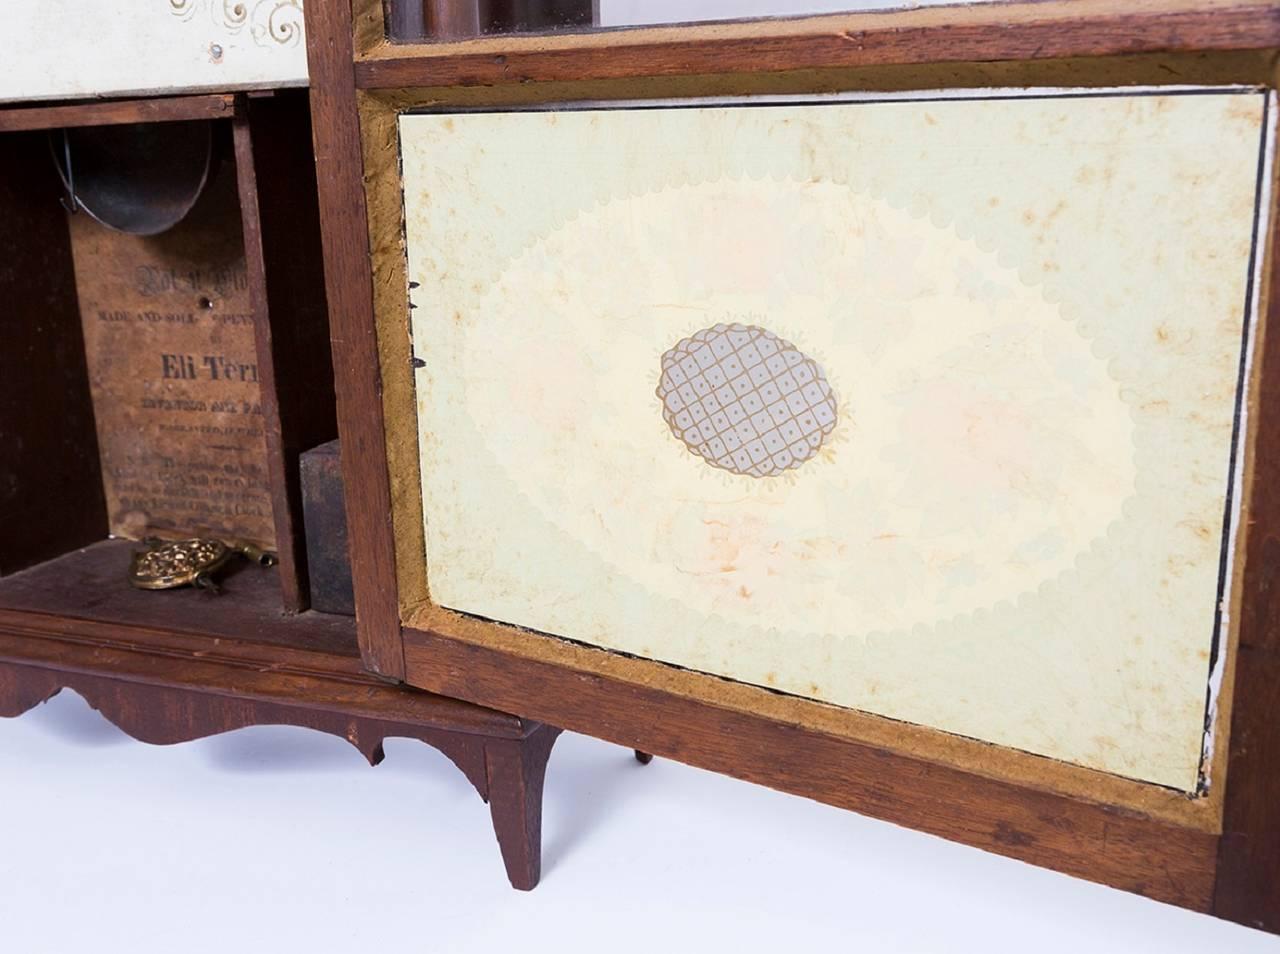 Eli Terry Pillar And Scroll Mahogany Mantel Clock At 1stdibs